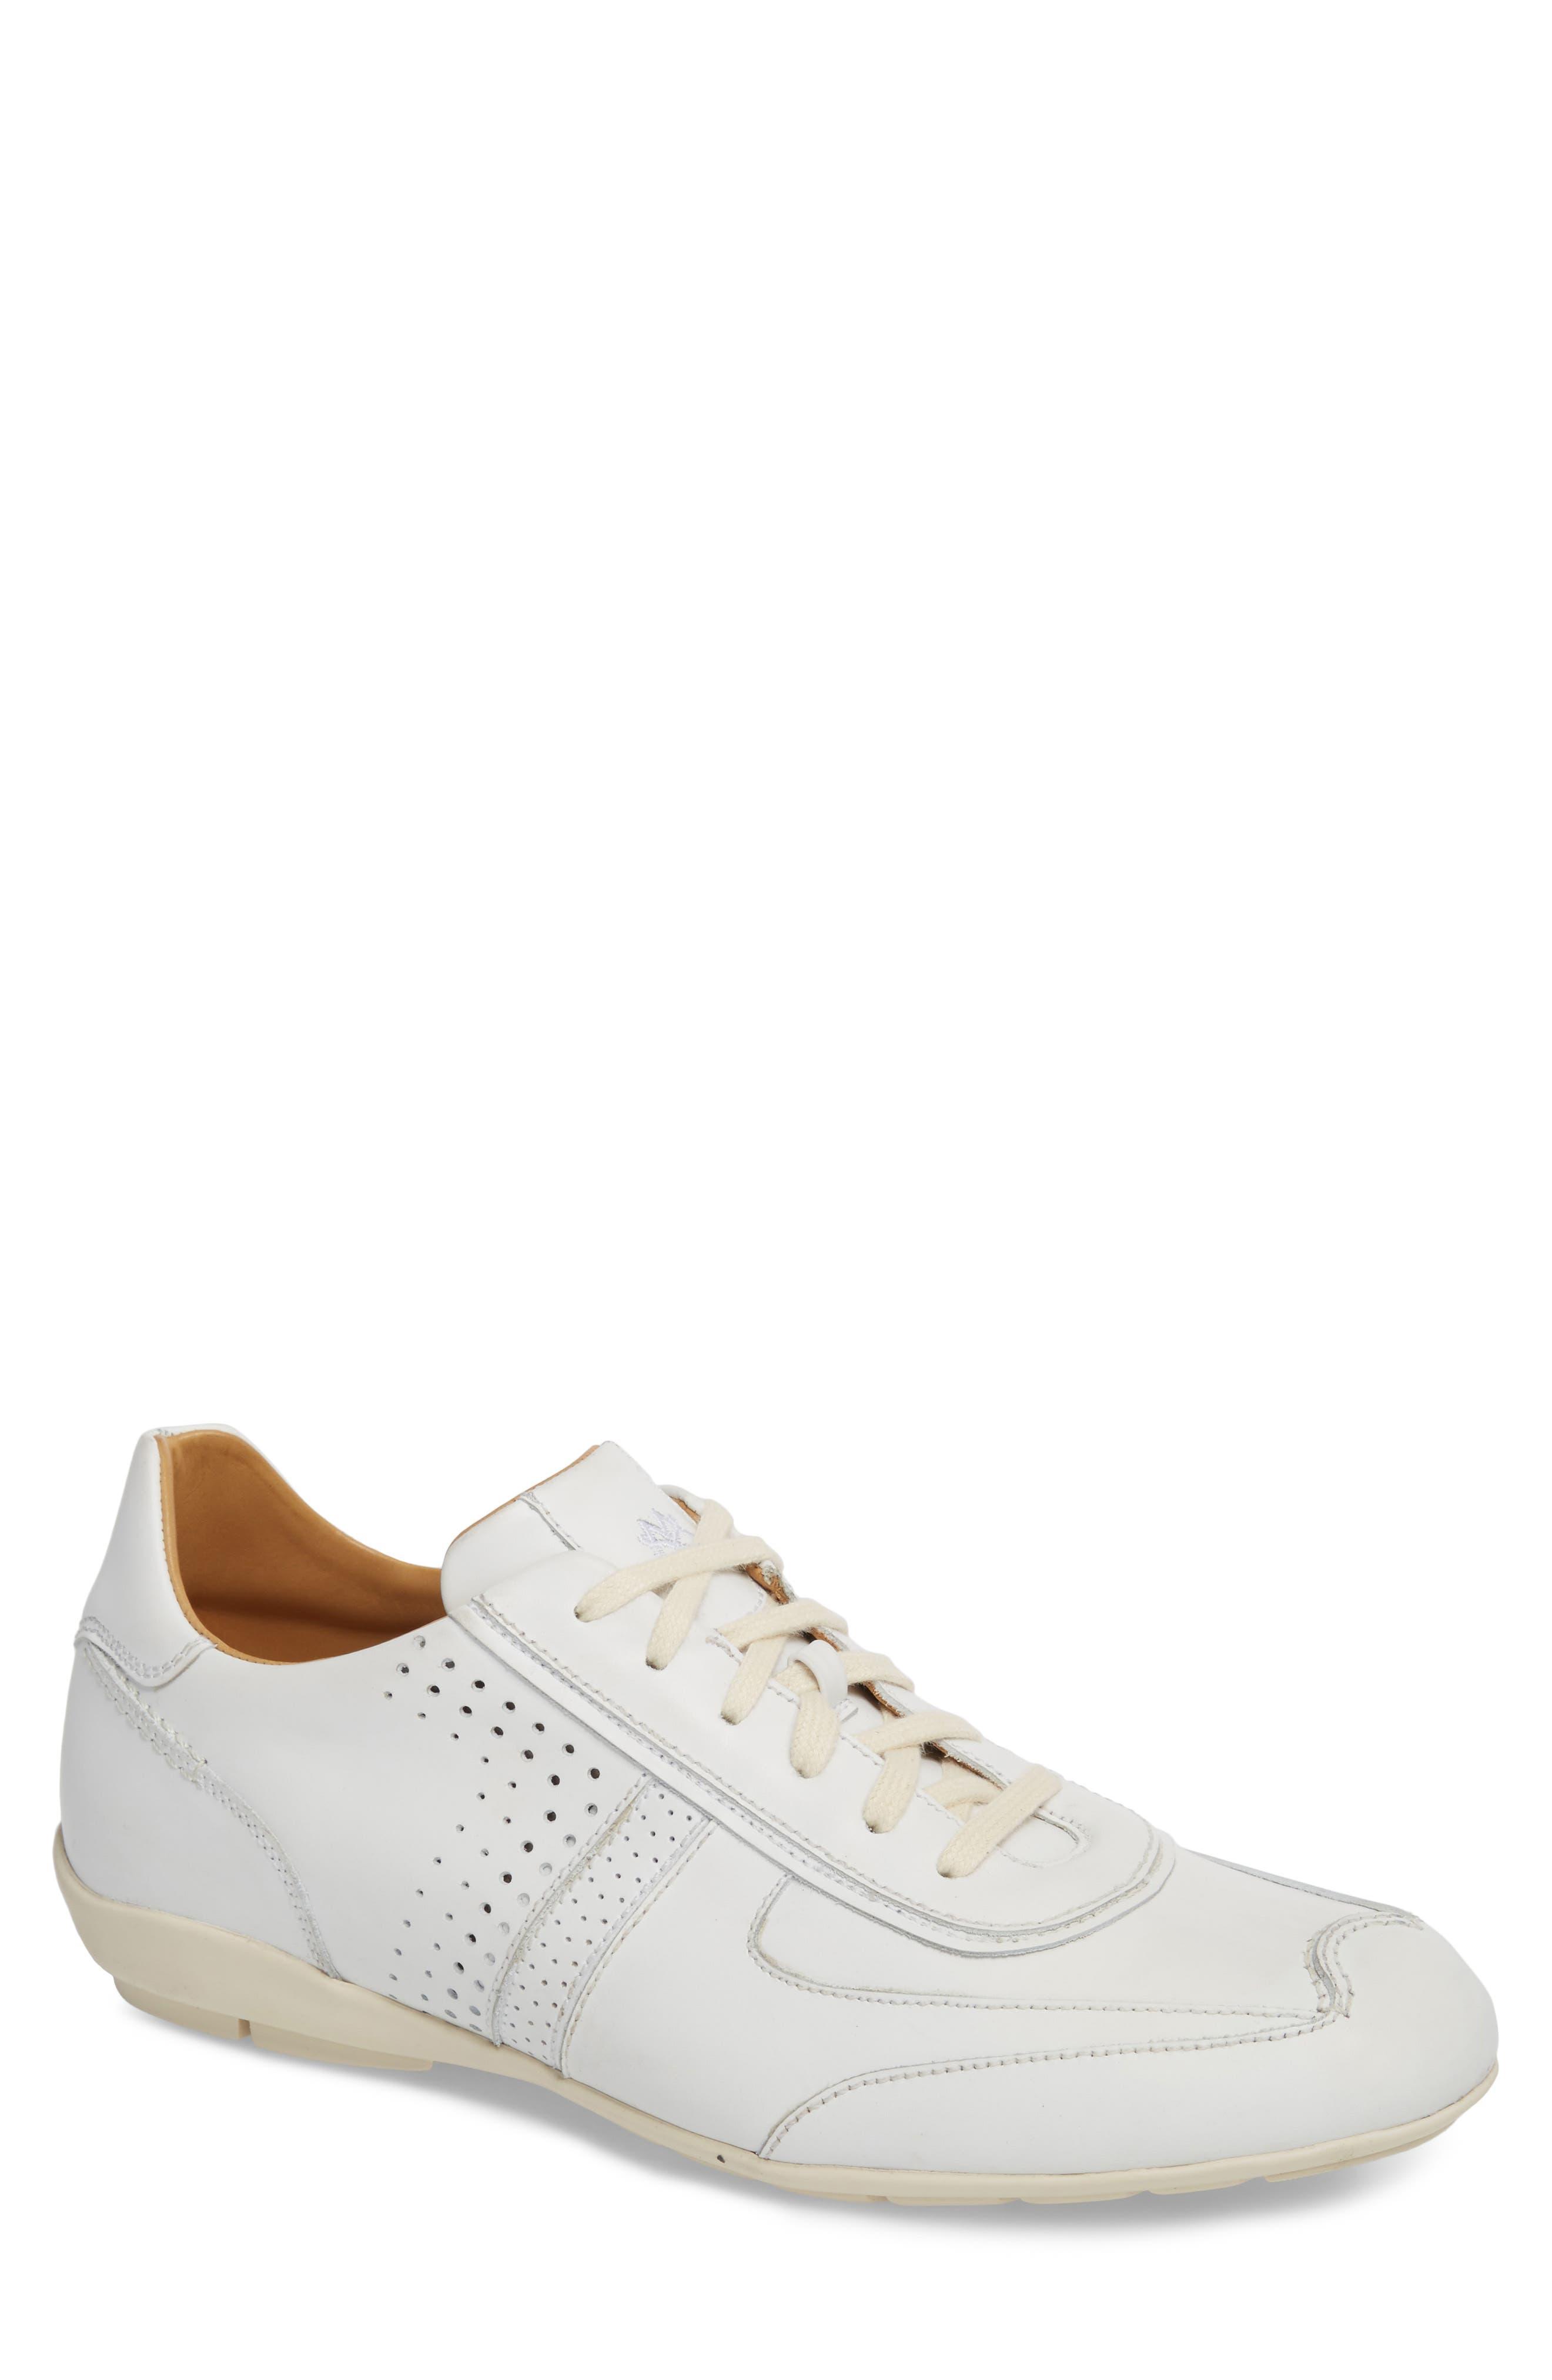 Lozano II Low Top Sneaker,                         Main,                         color, WHITE LEATHER